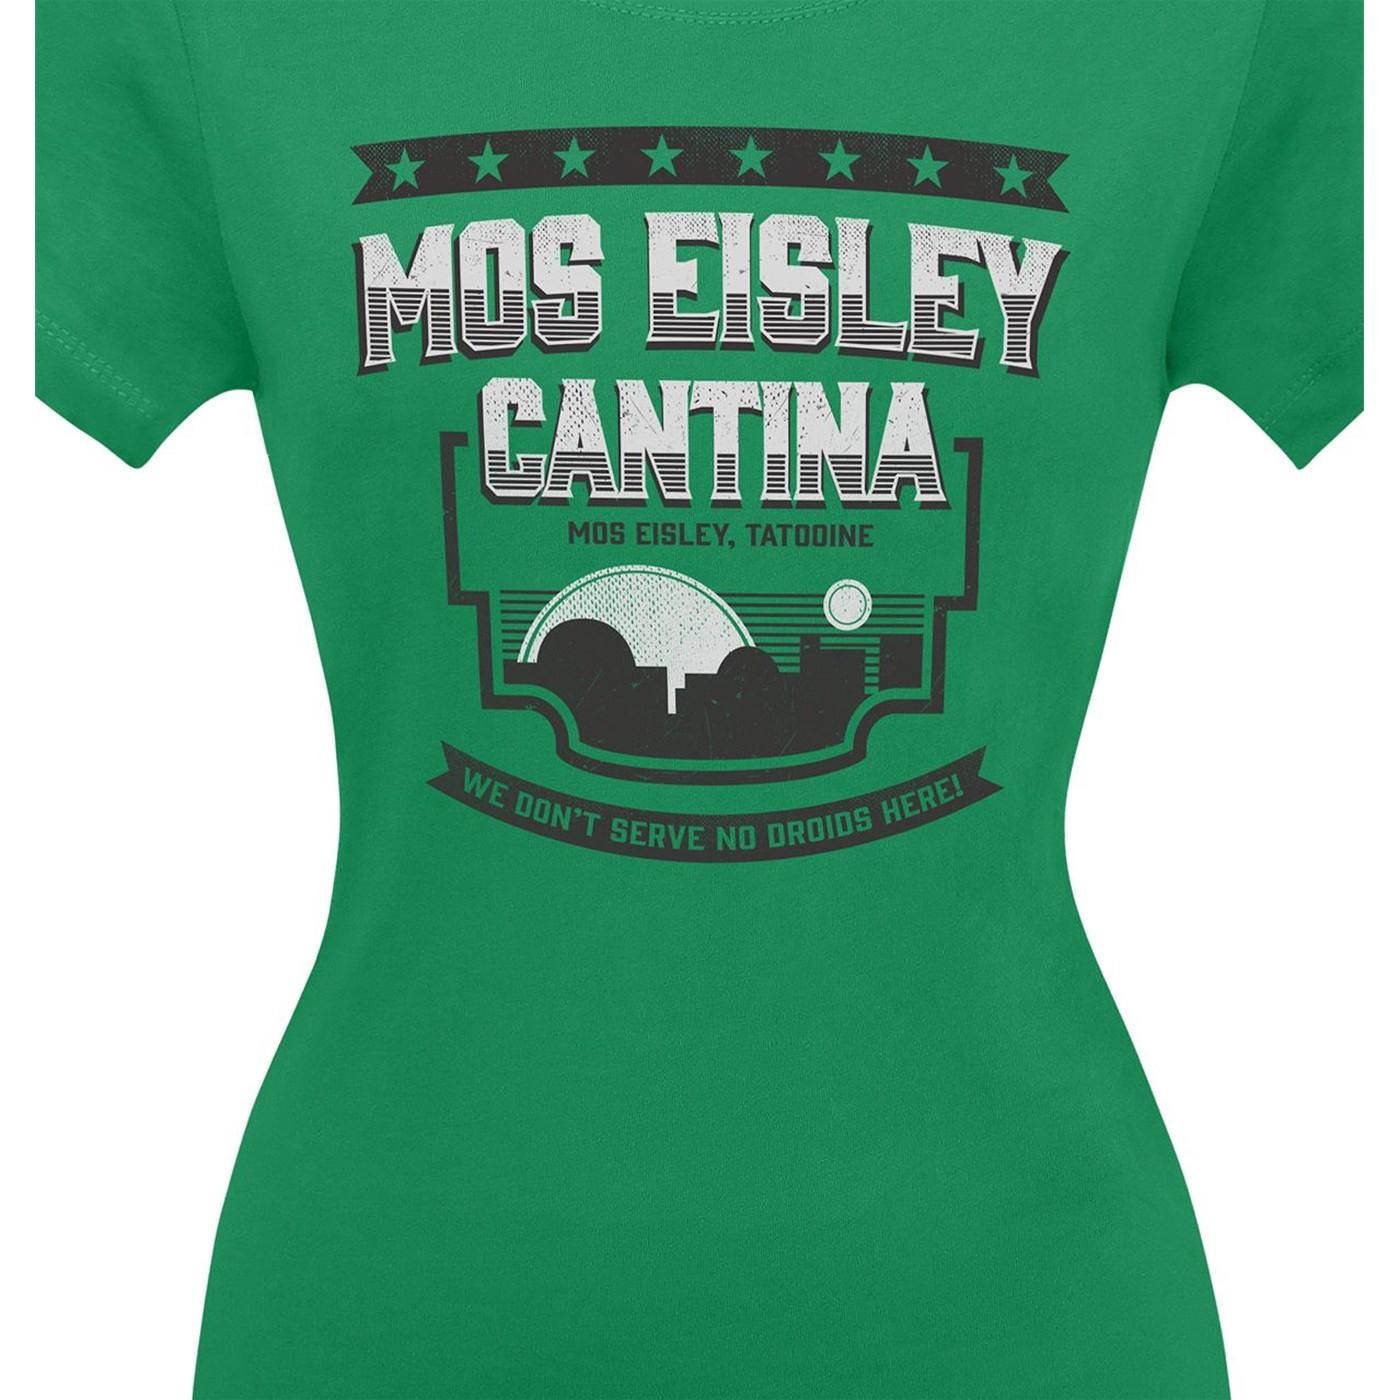 Mos Eisley Cantina Women's T-Shirt